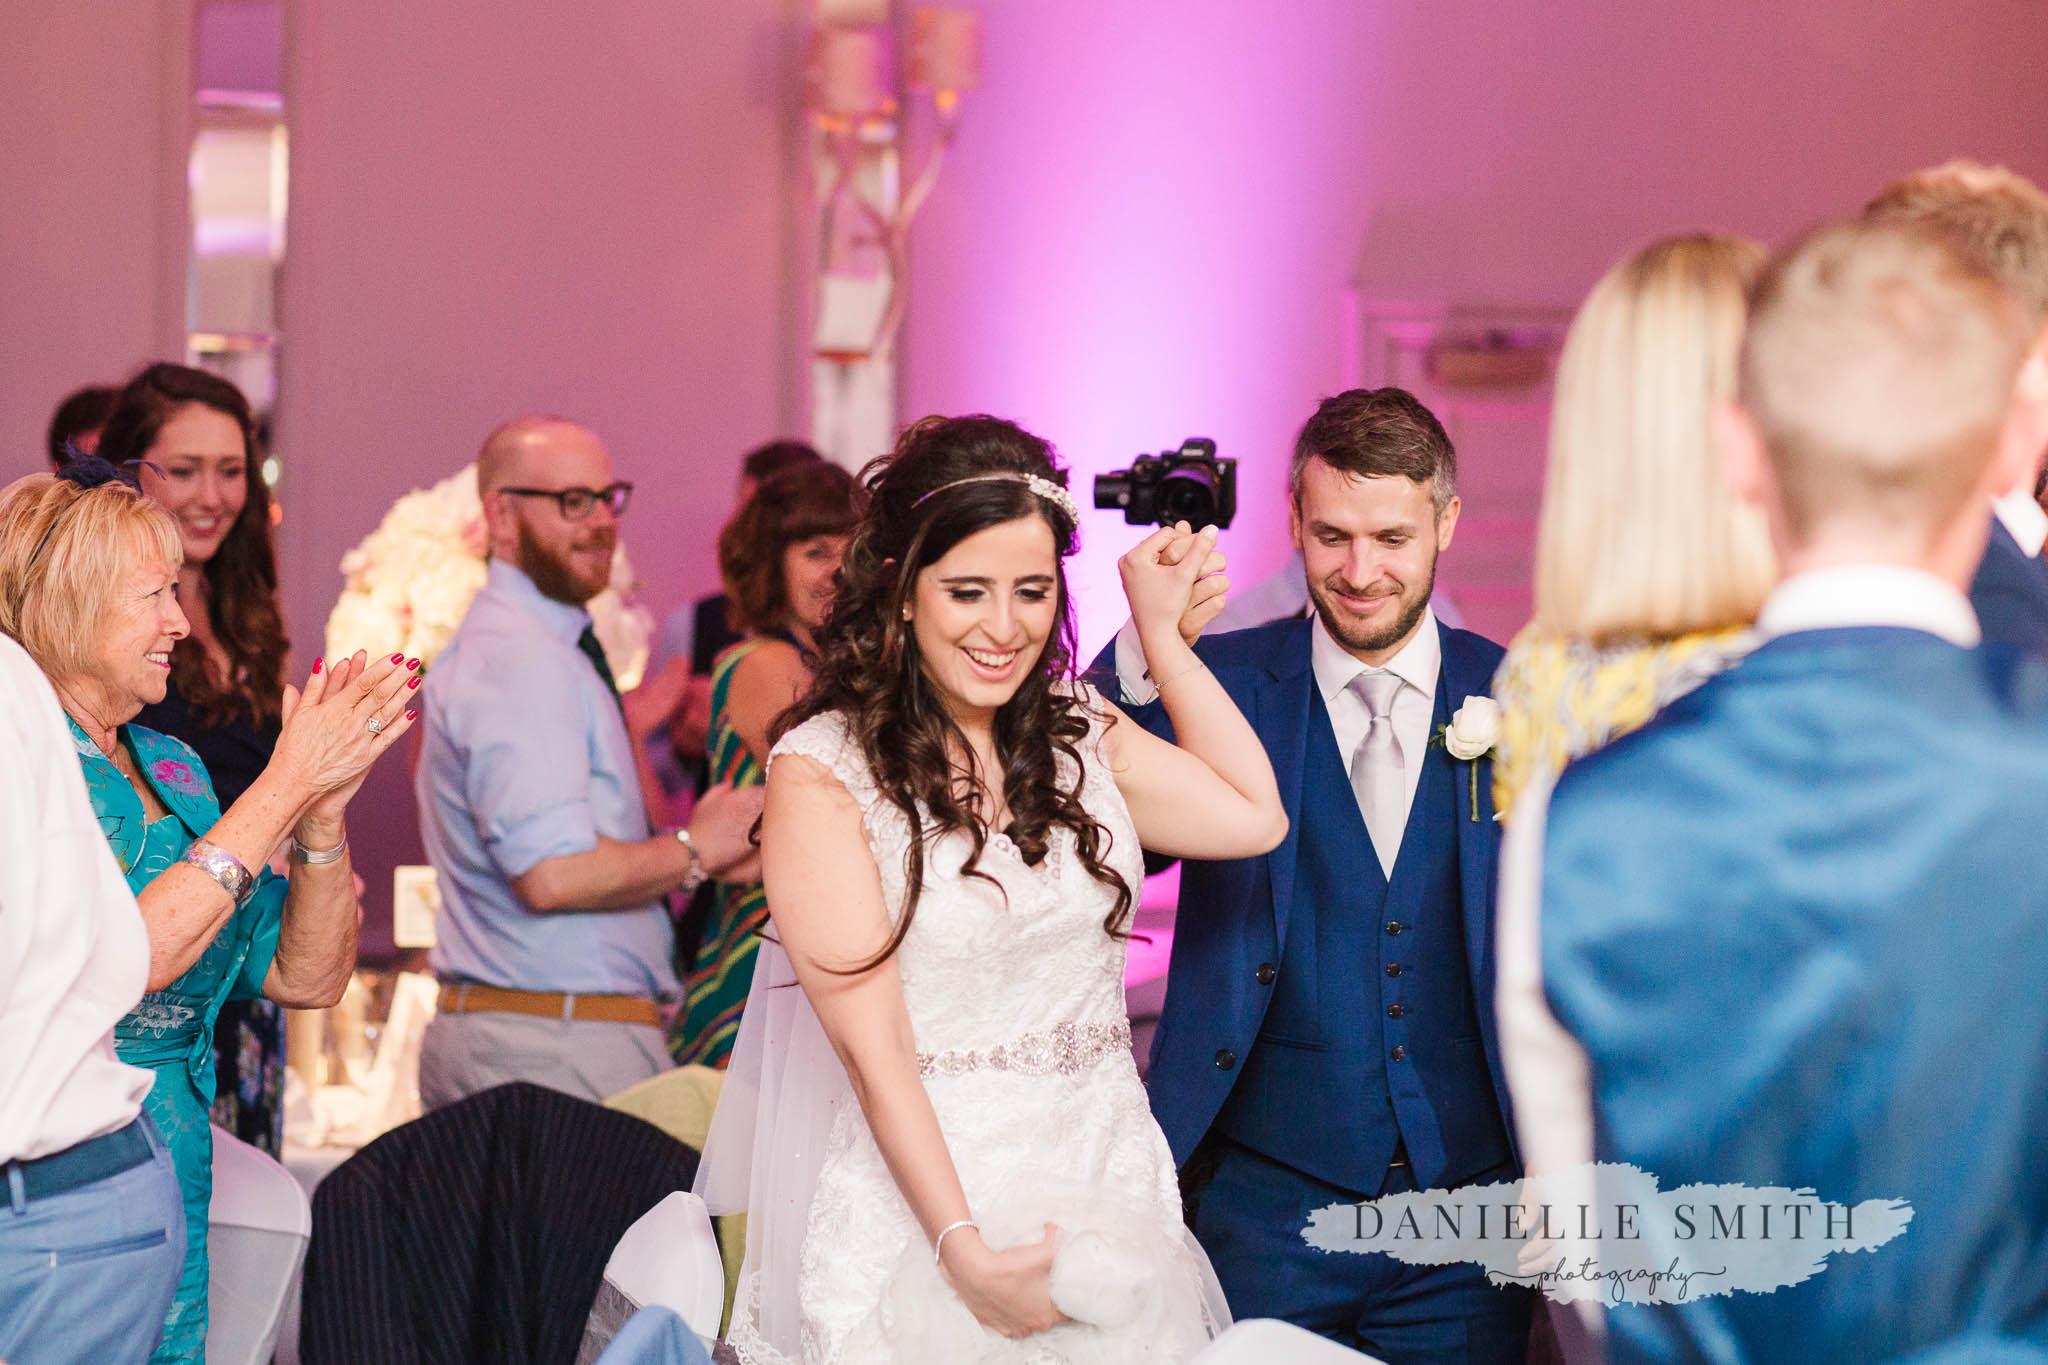 bride and groom entrance to reception room